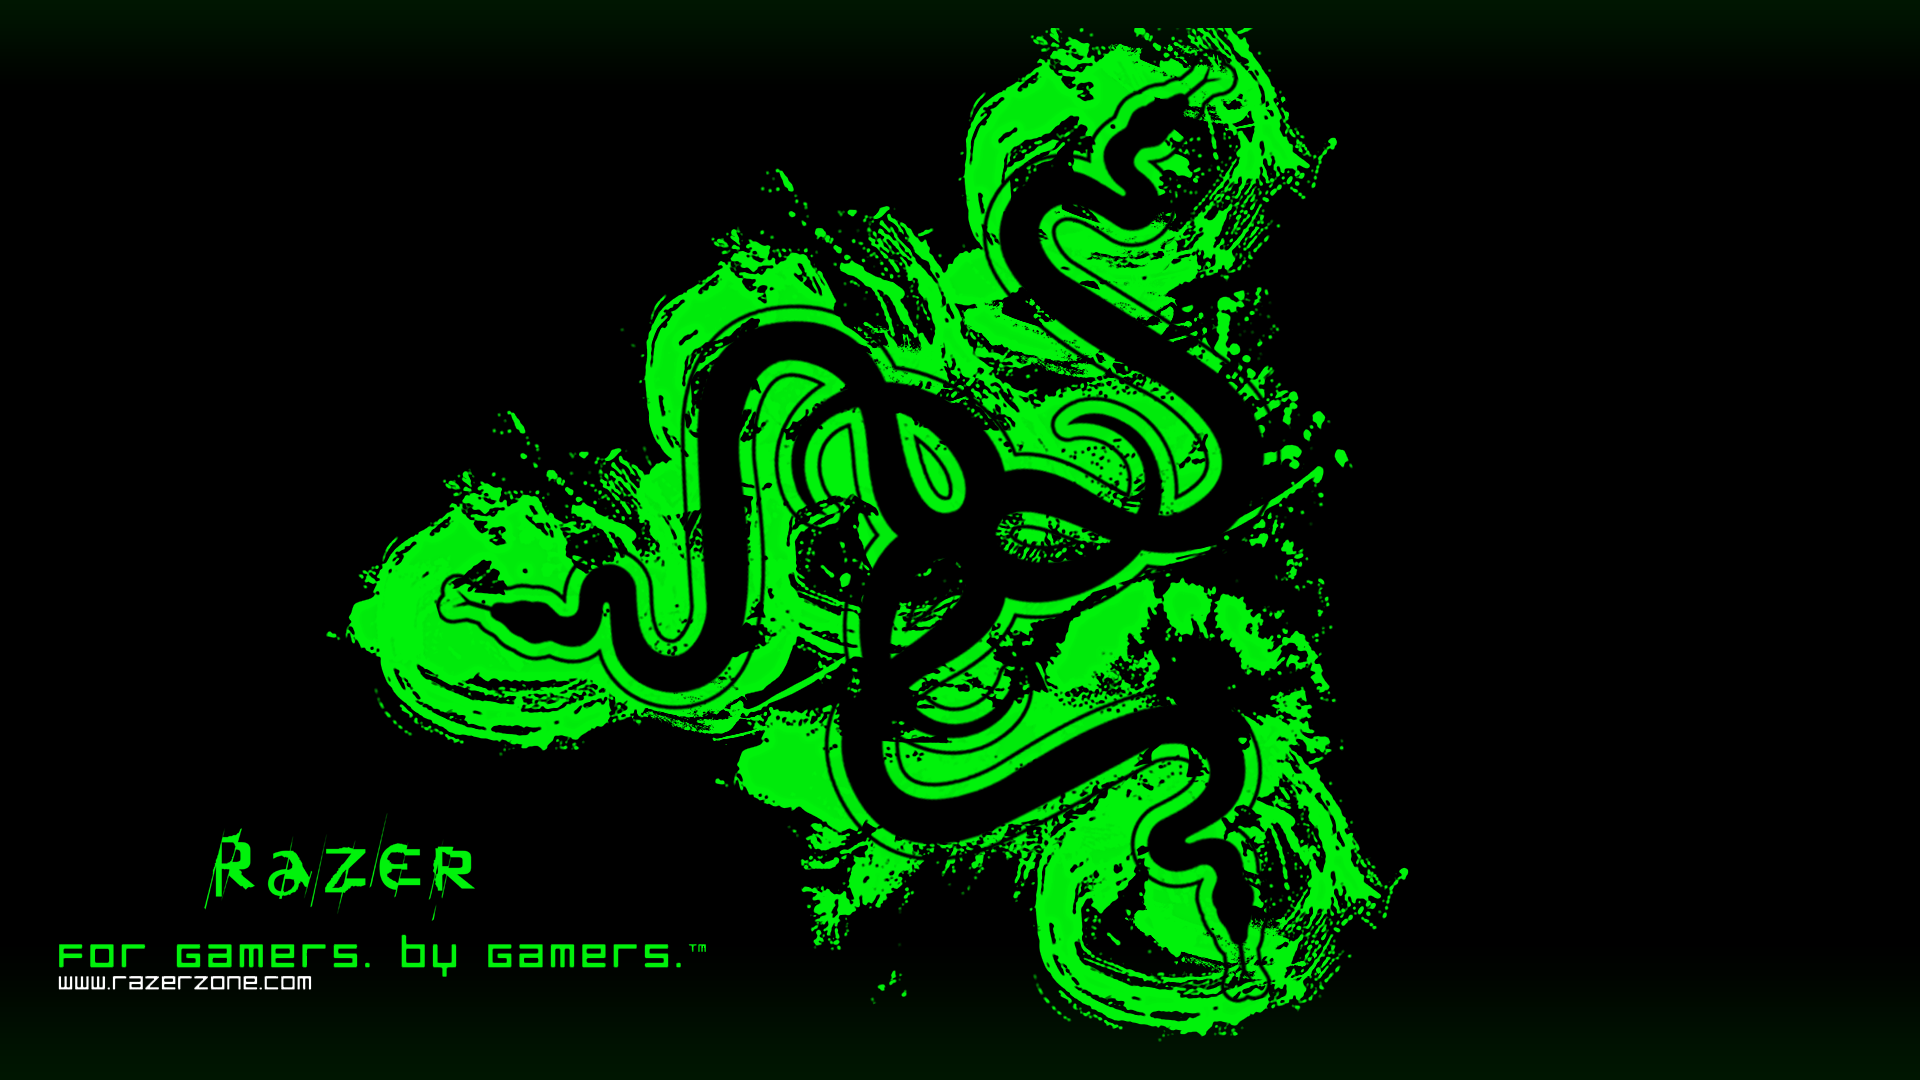 Razer Gaming Wallpapers Razer Gaming Wallpapers 1920x1080